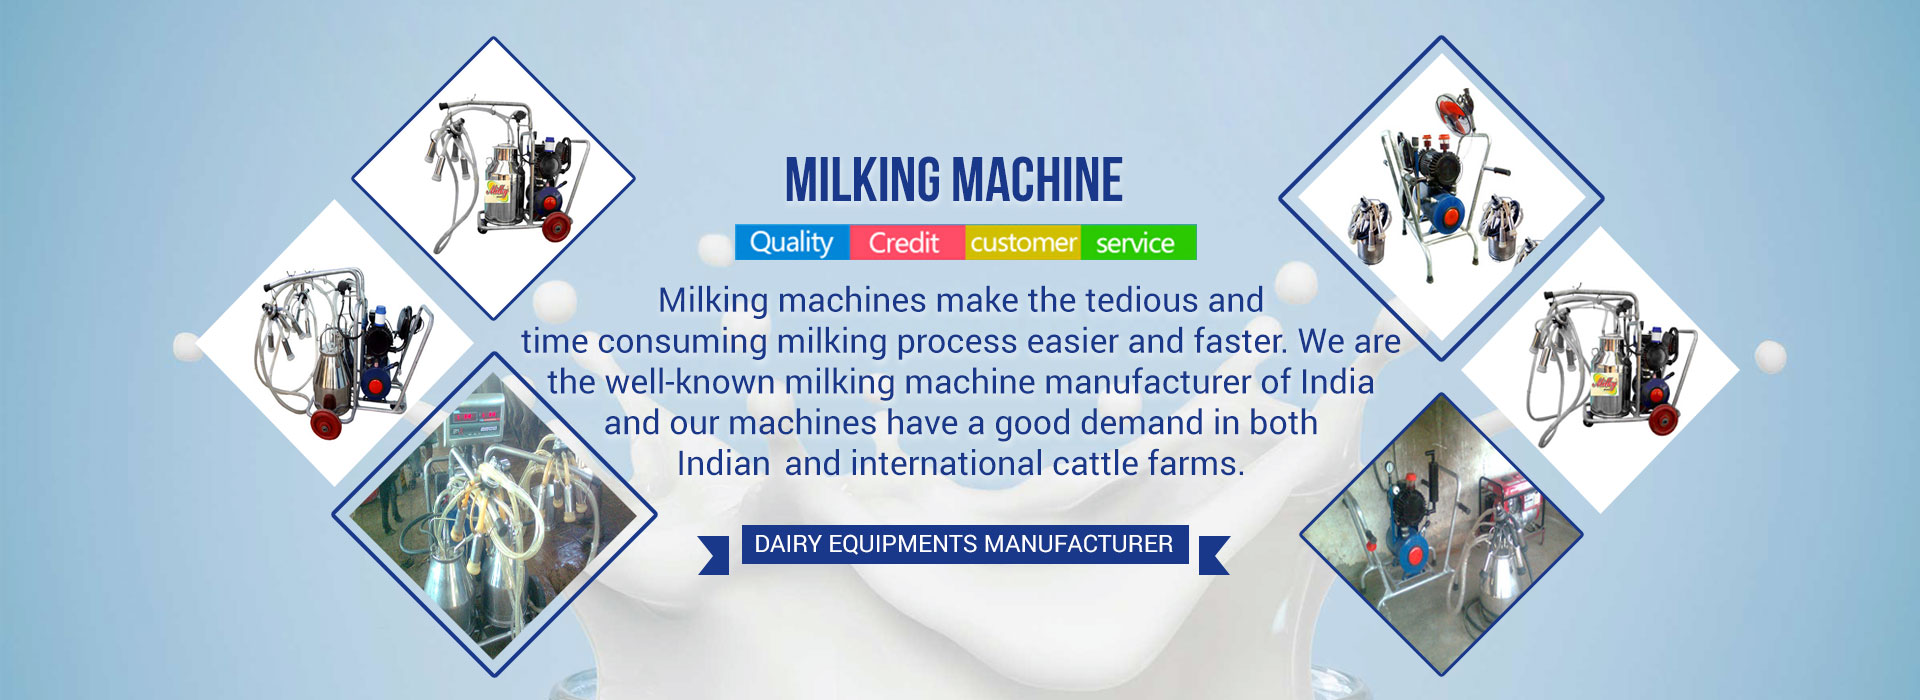 dairy-equipments